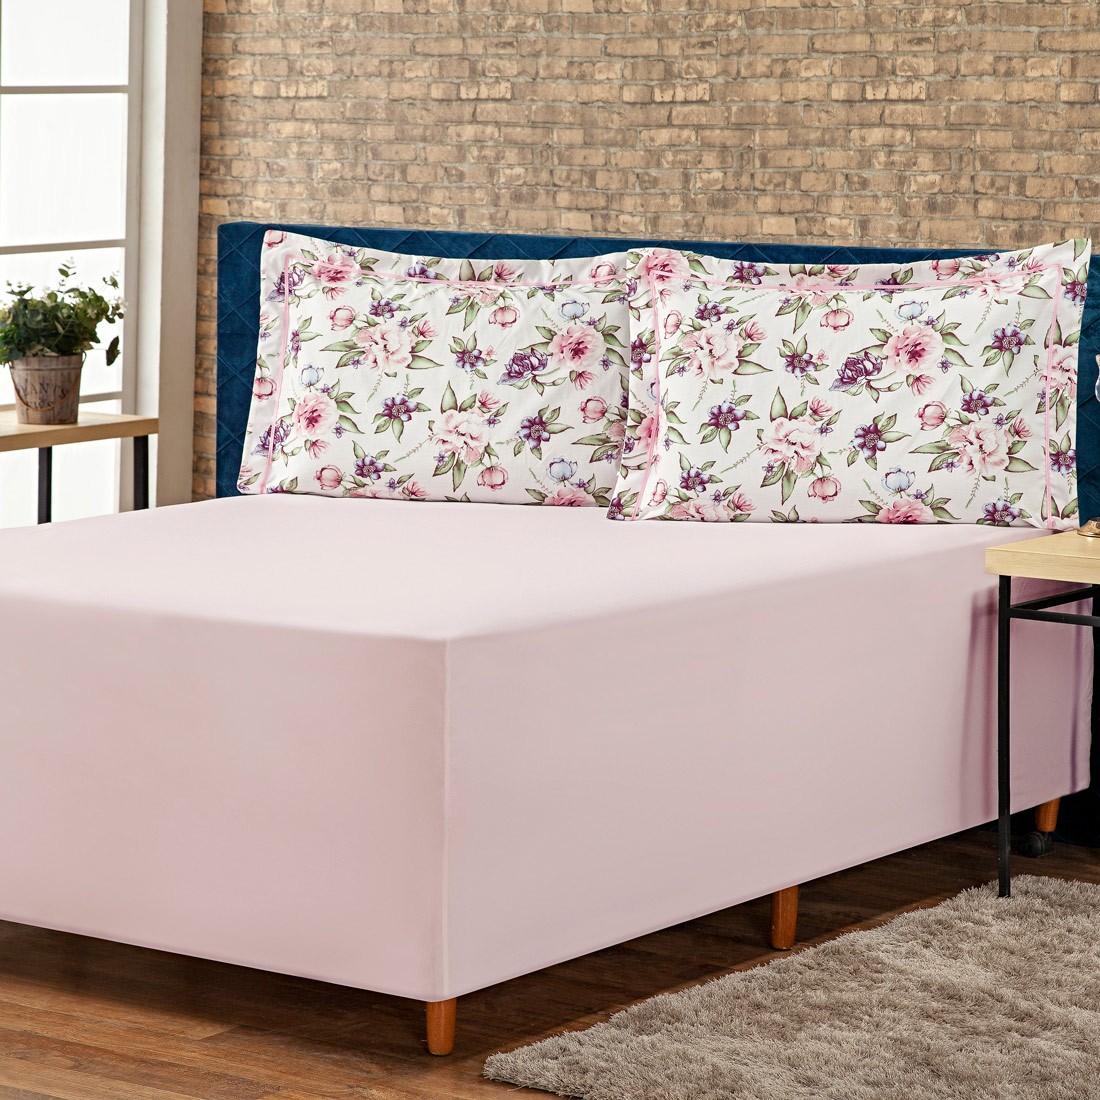 Jogo de Lençol p/ Cama Box Complet Floral Rosa Queen 03 Peças - Percal 140 Fios